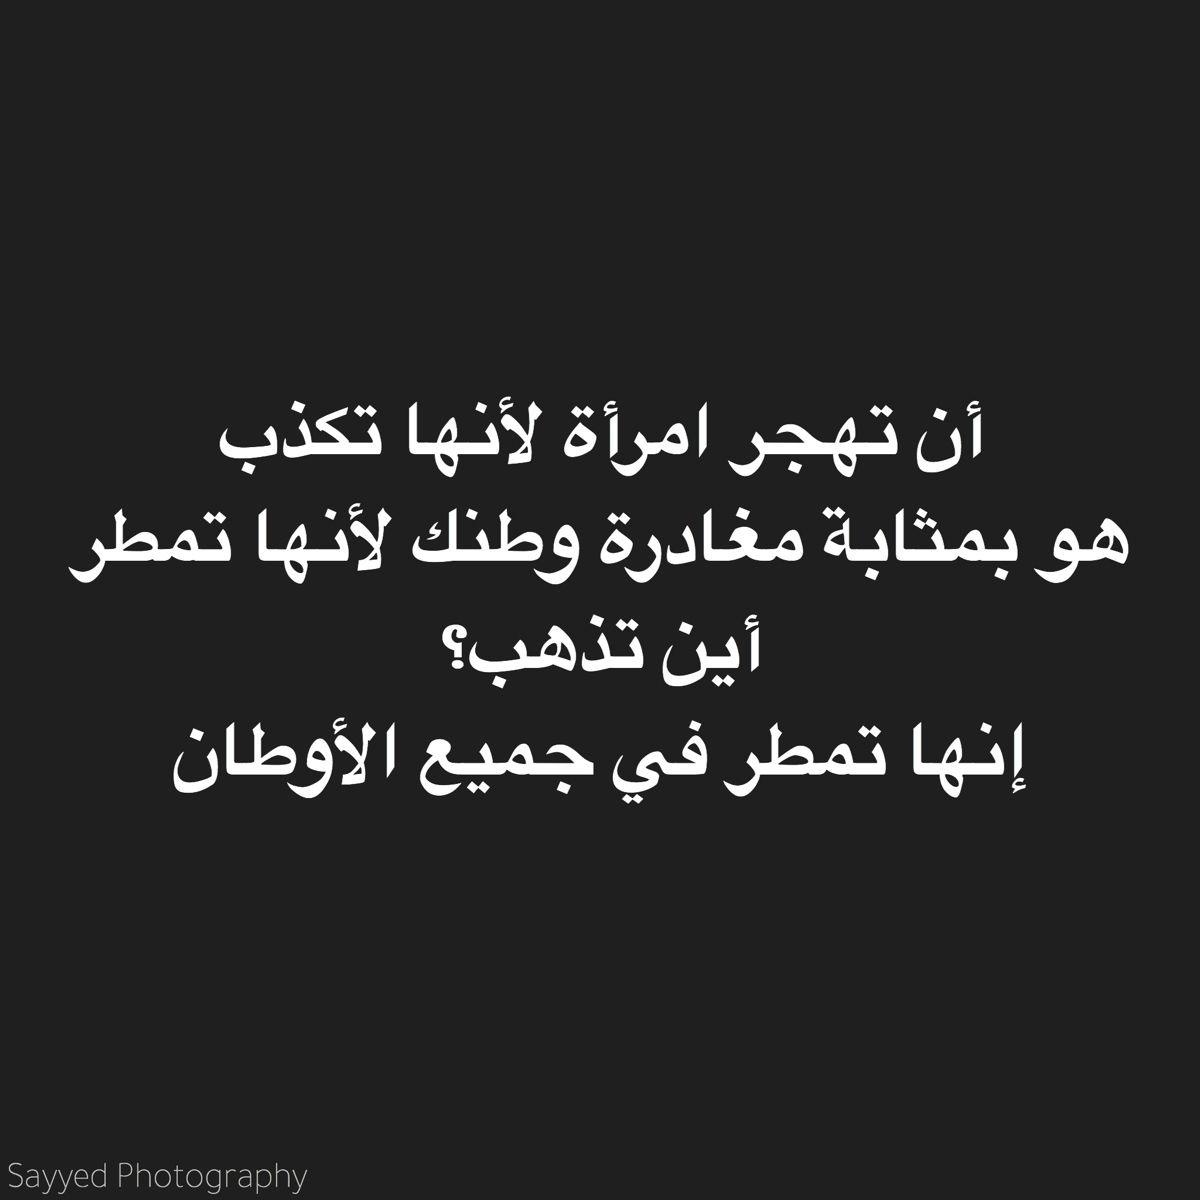 أن تهجر امرأة لأنها تكذب Arabic Calligraphy Calligraphy Photography